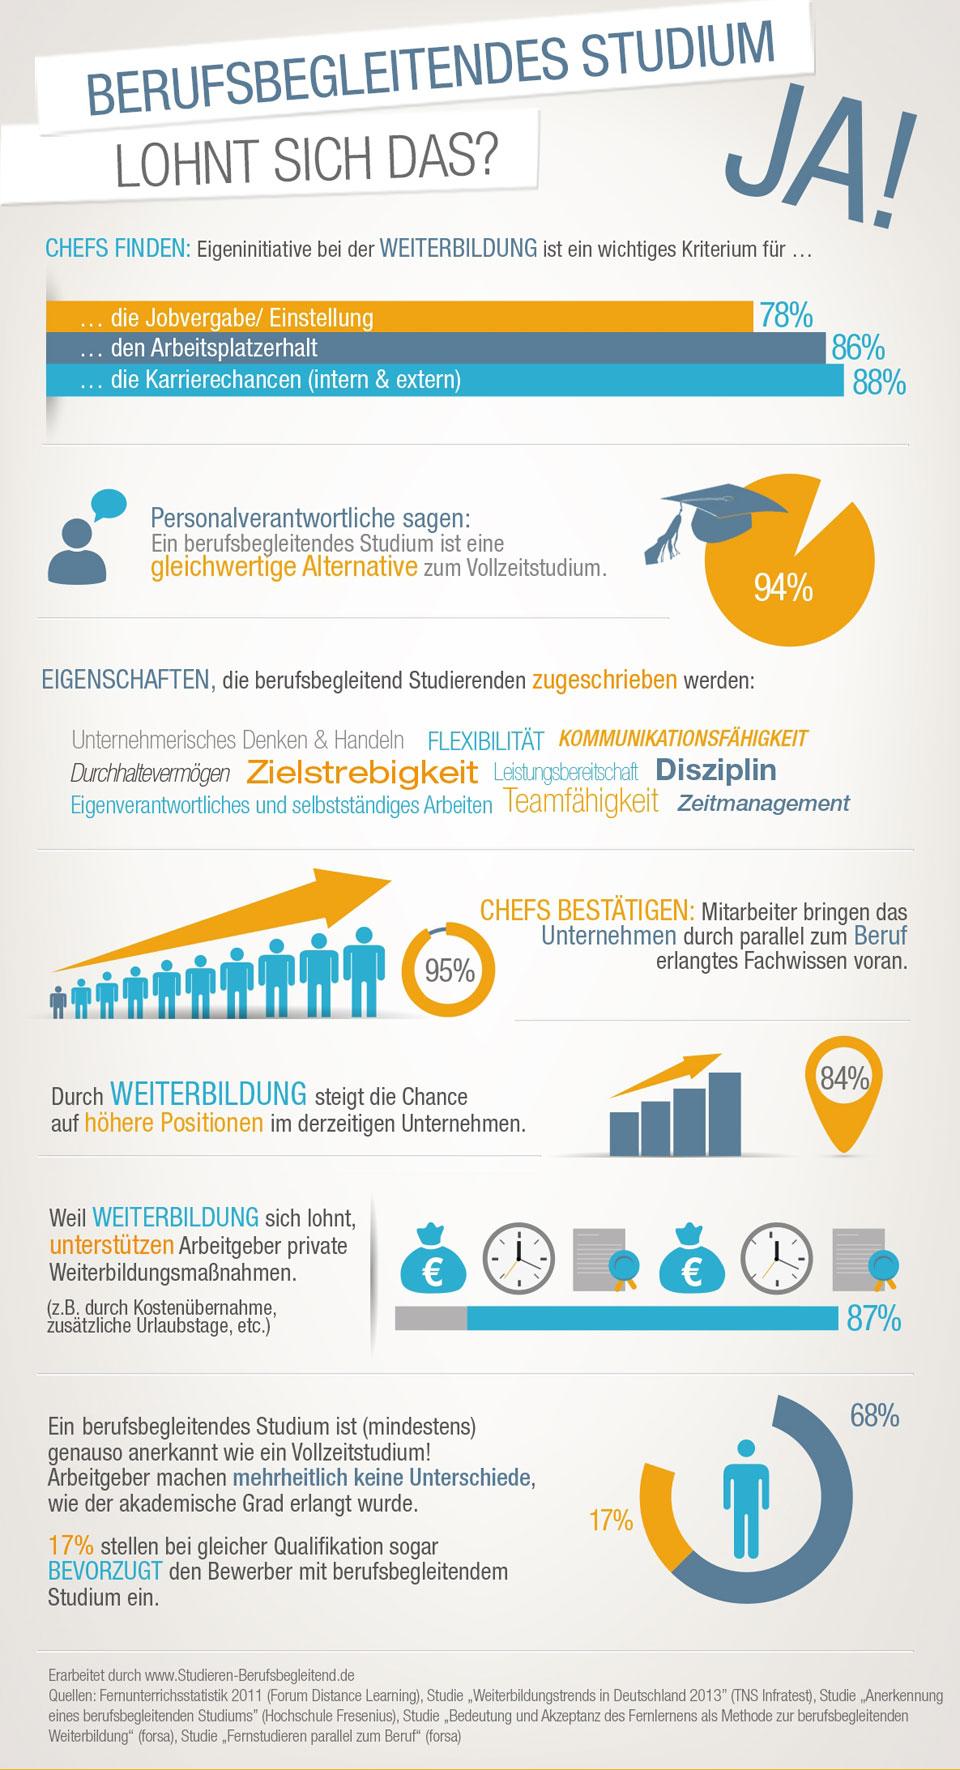 Infografik zum Berufsbegleitendem Studium